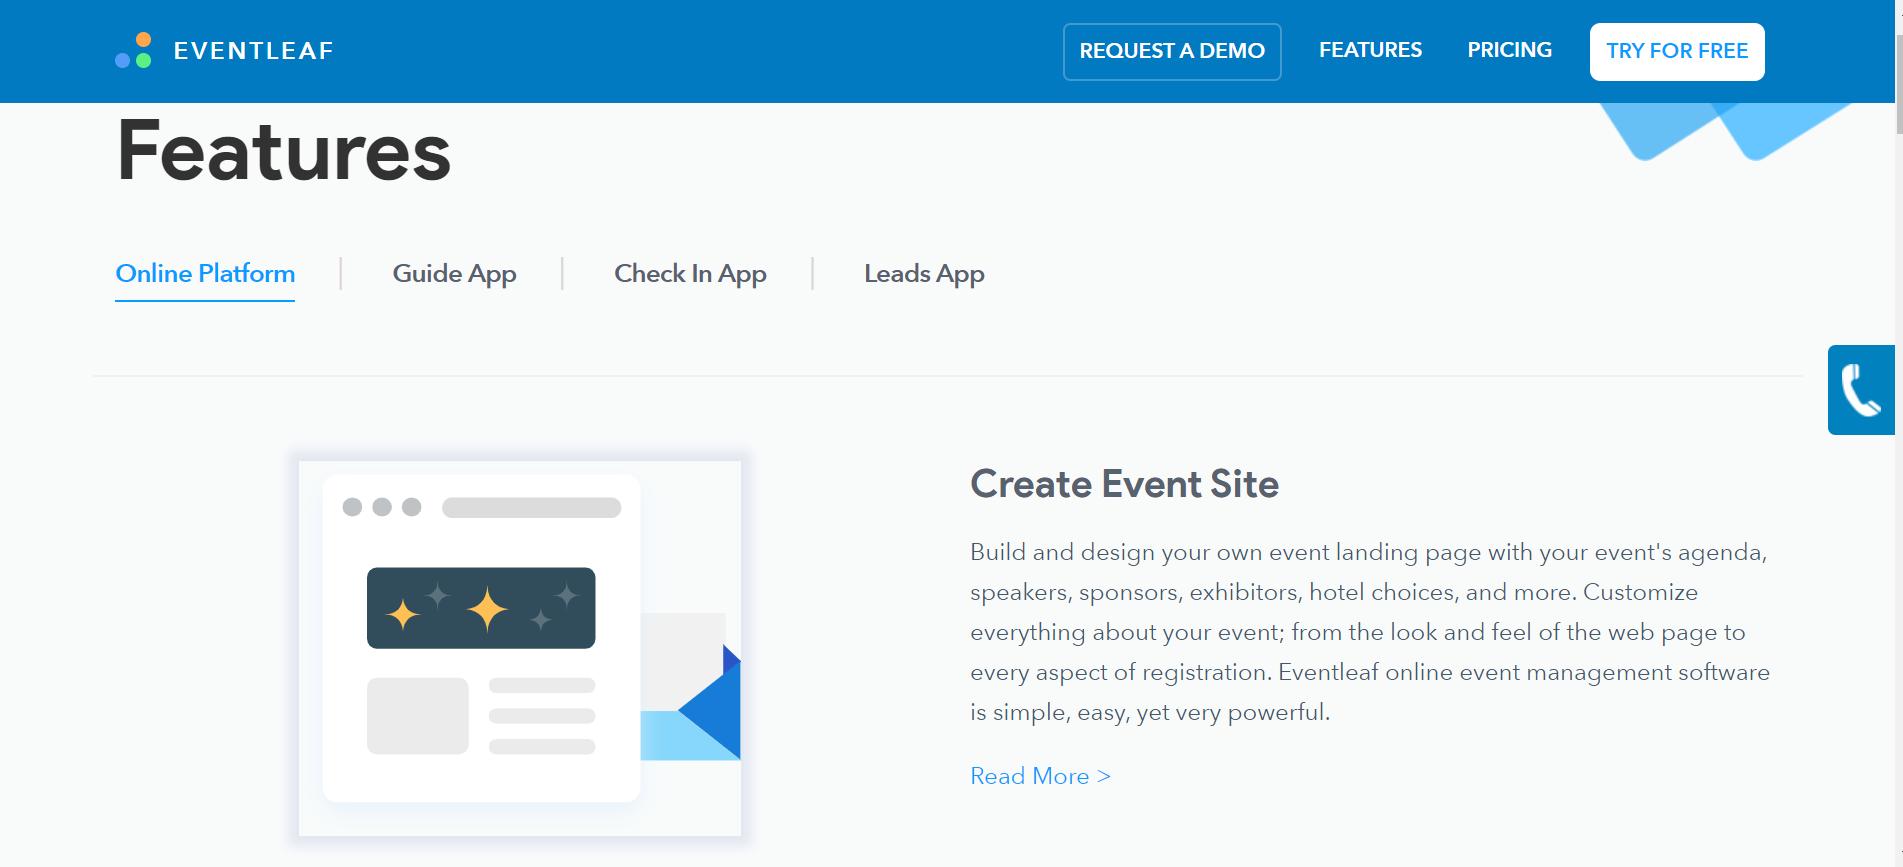 Eventleaf-Eventleaf_Online_Event_Management_Software_and_Apps_Features